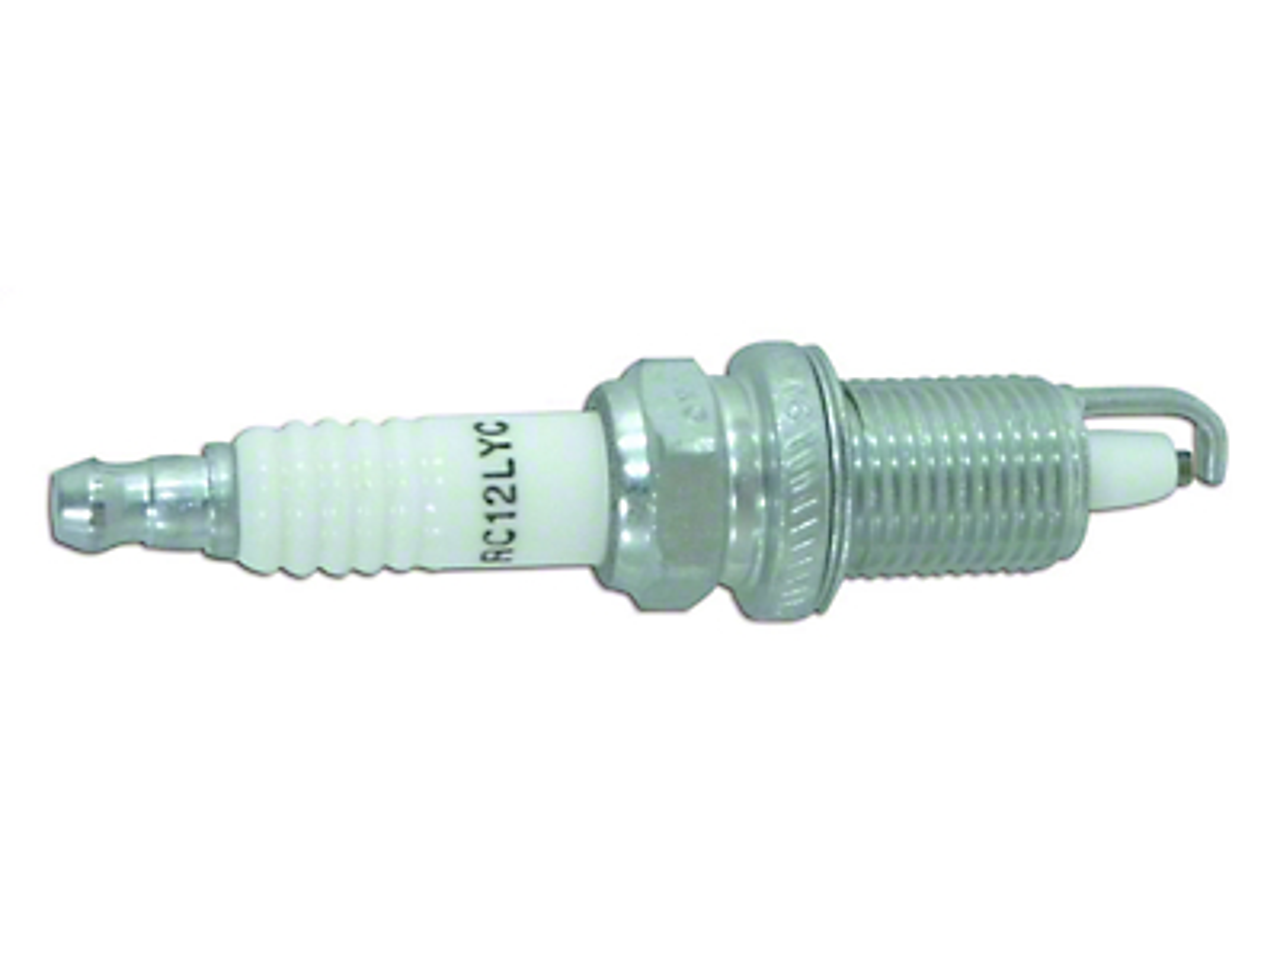 Omix-ADA RC12LYC Spark Plug (87-98 2.5L or 4.0L Jeep Wrangler YJ & TJ)